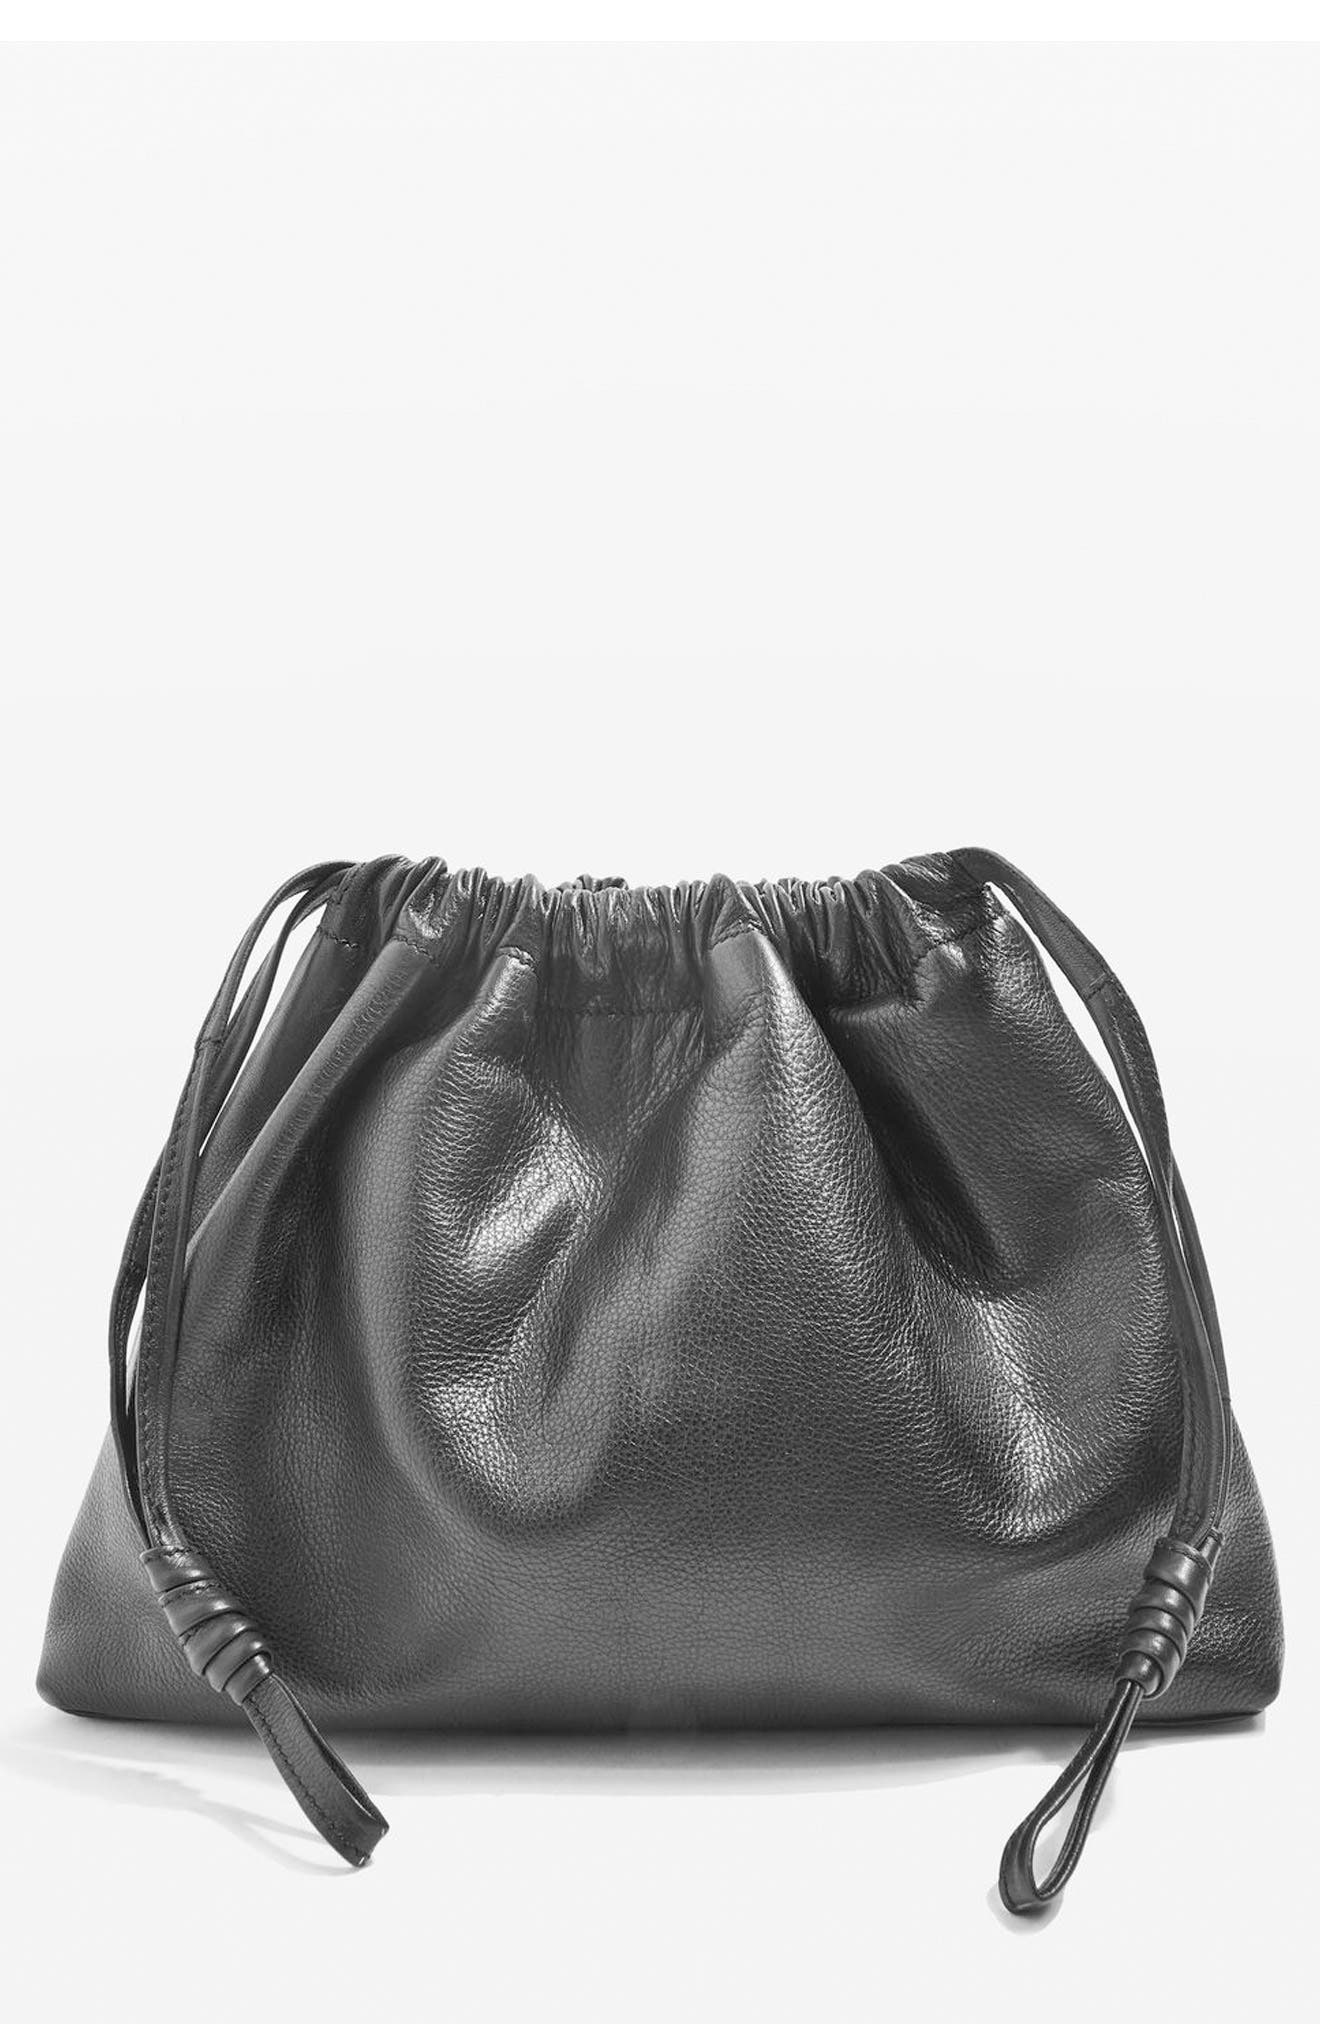 Topshop Drawstring Leather Crossbody Bag